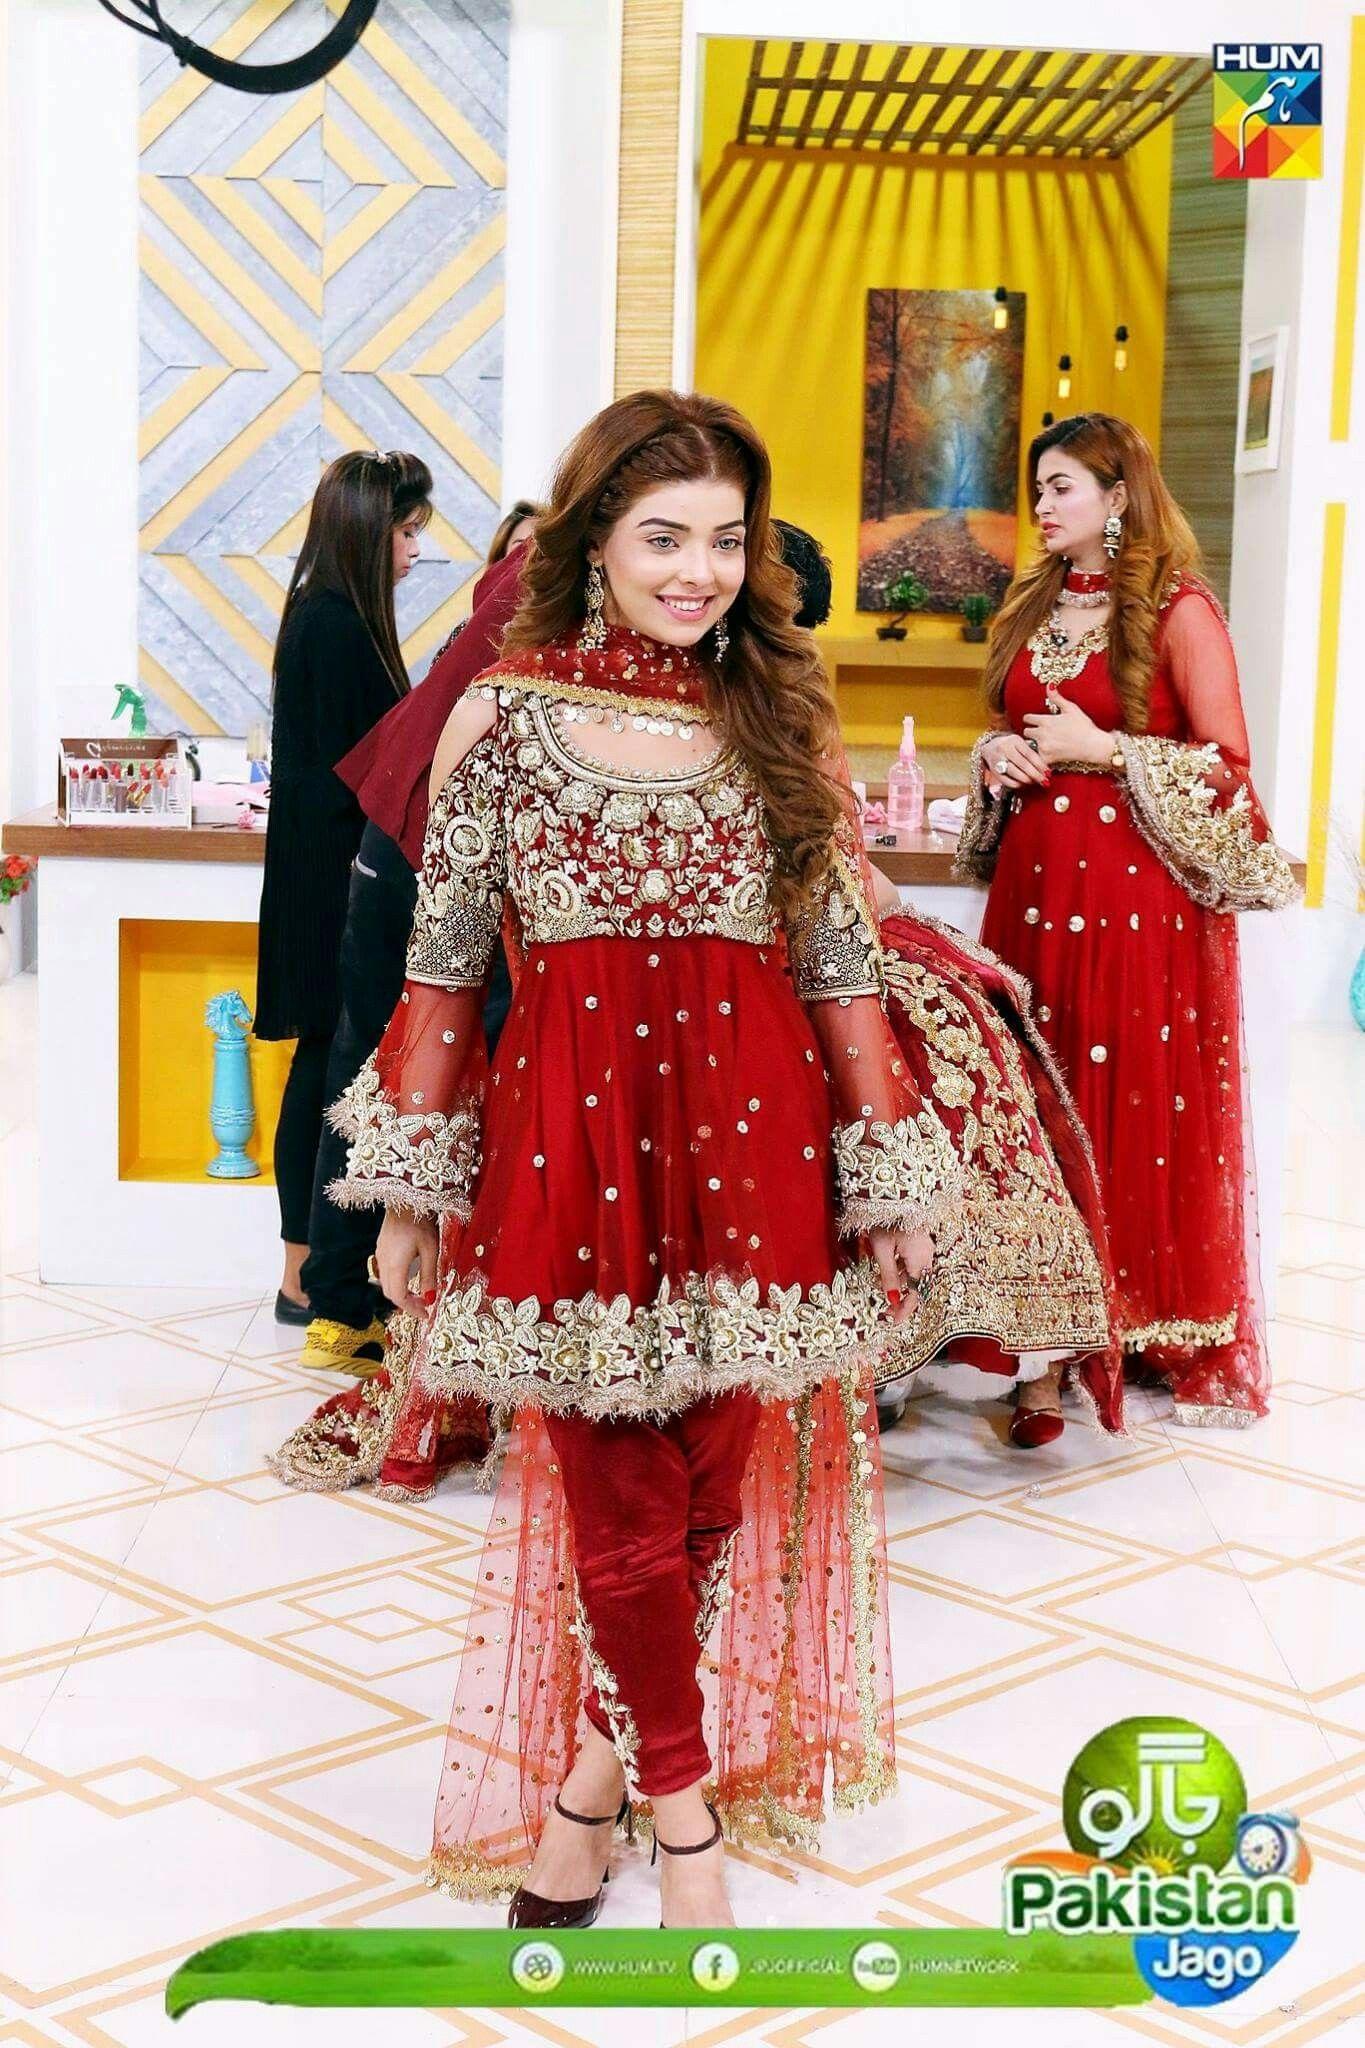 Pin by 👑mar u.j👑 on Derass Pakistani wedding outfits